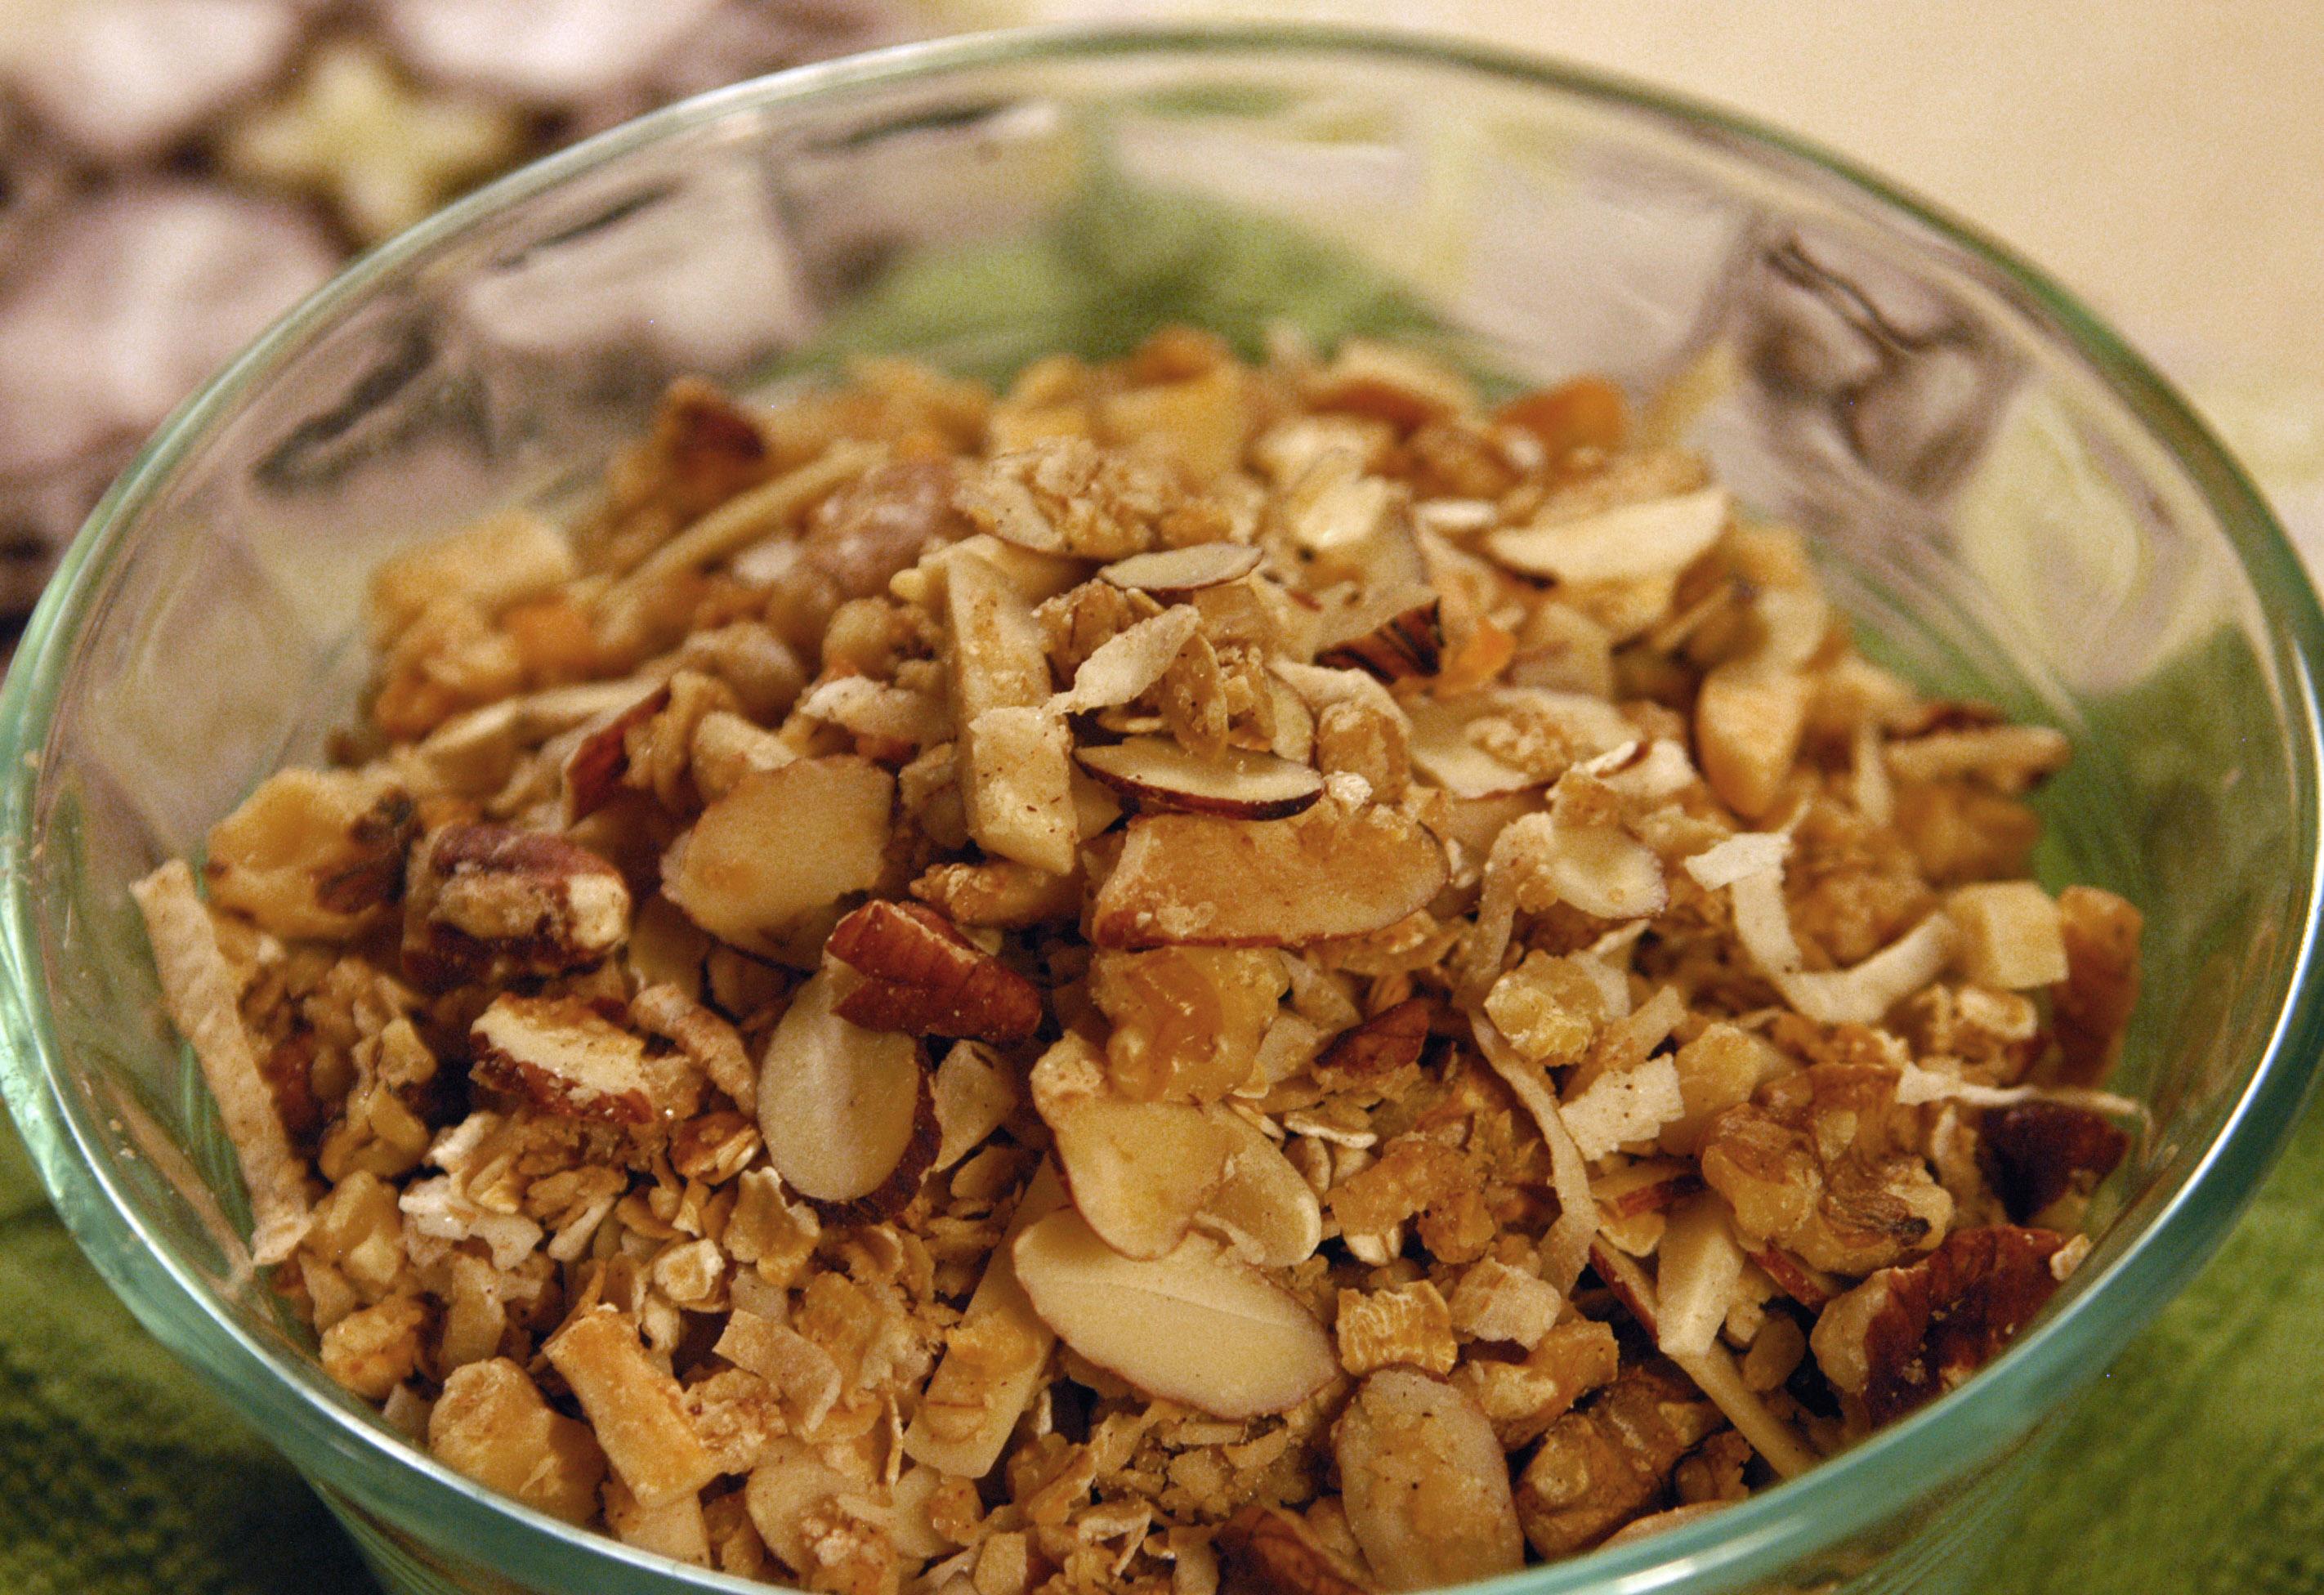 Healthy Delicious Homemade Granola